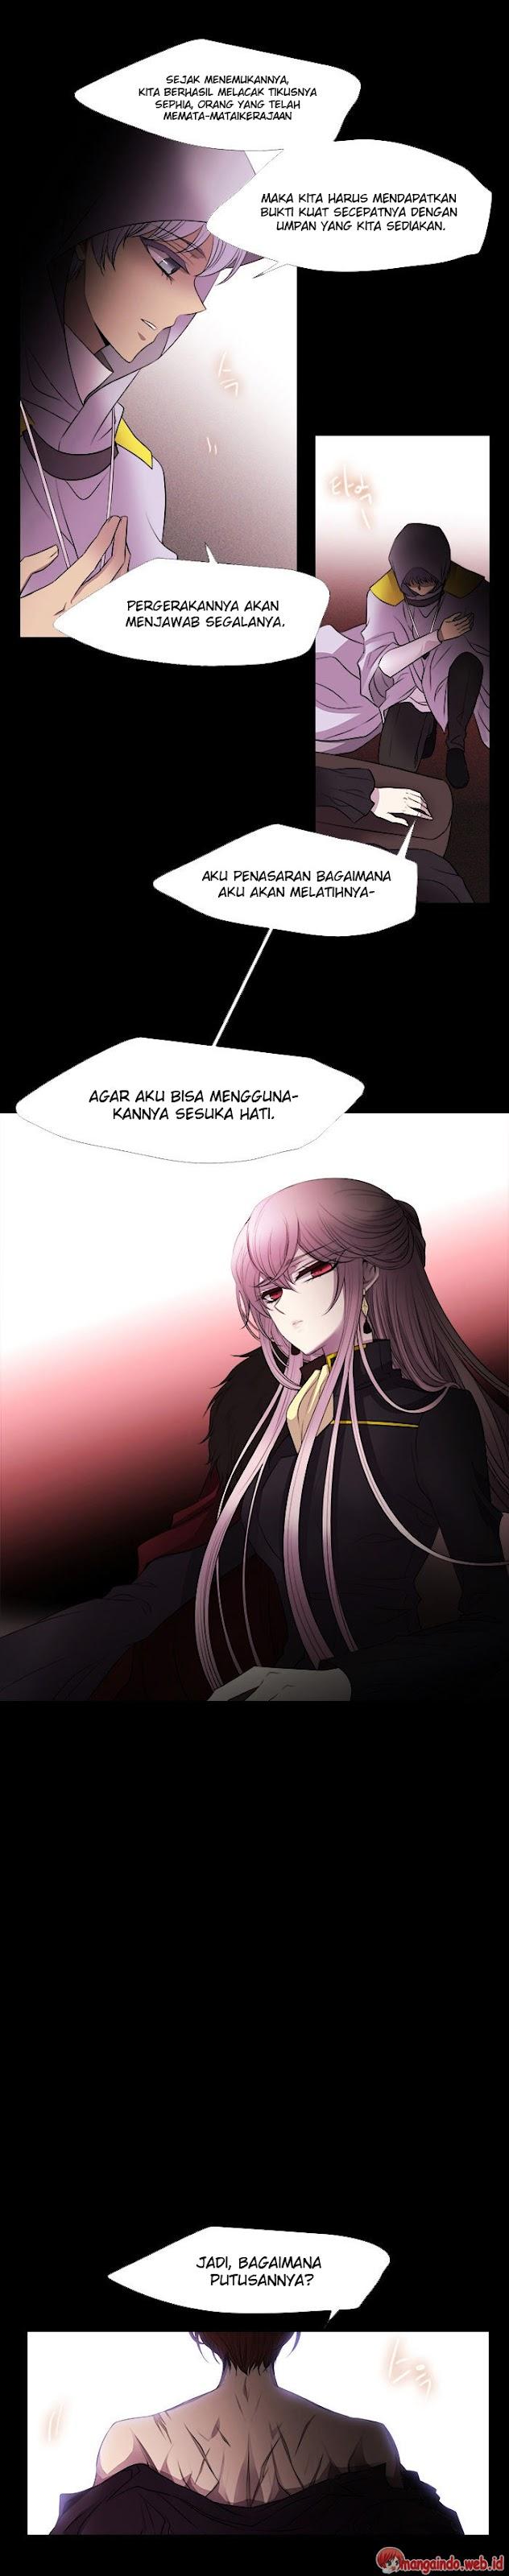 Komik black haze 212 - chapter 212 213 Indonesia black haze 212 - chapter 212 Terbaru 9|Baca Manga Komik Indonesia